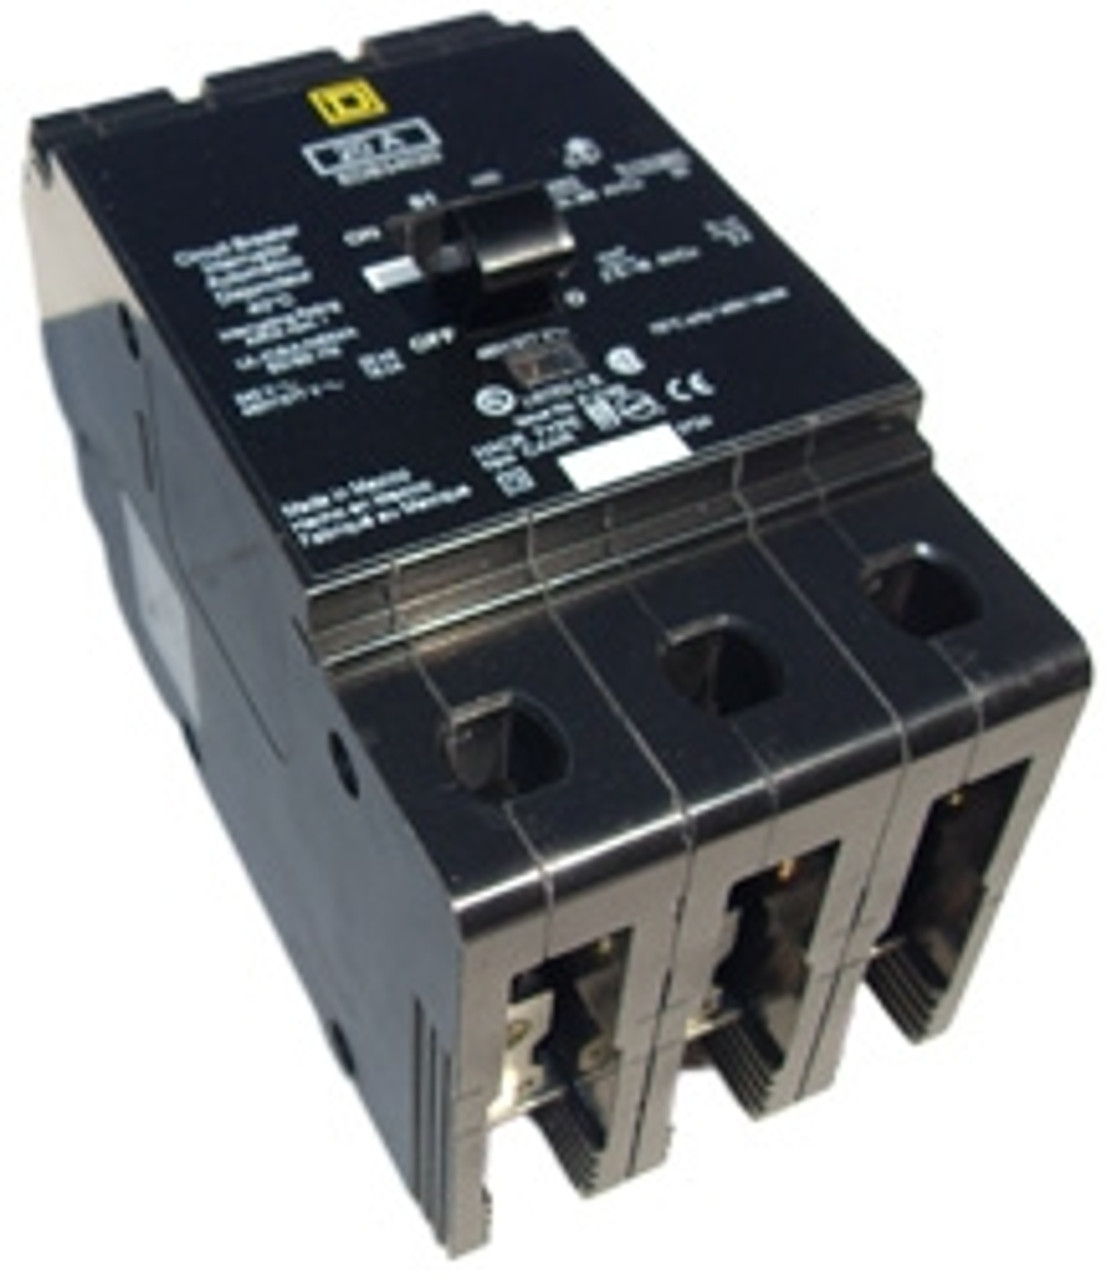 EHB24030  Square D 480vac breaker